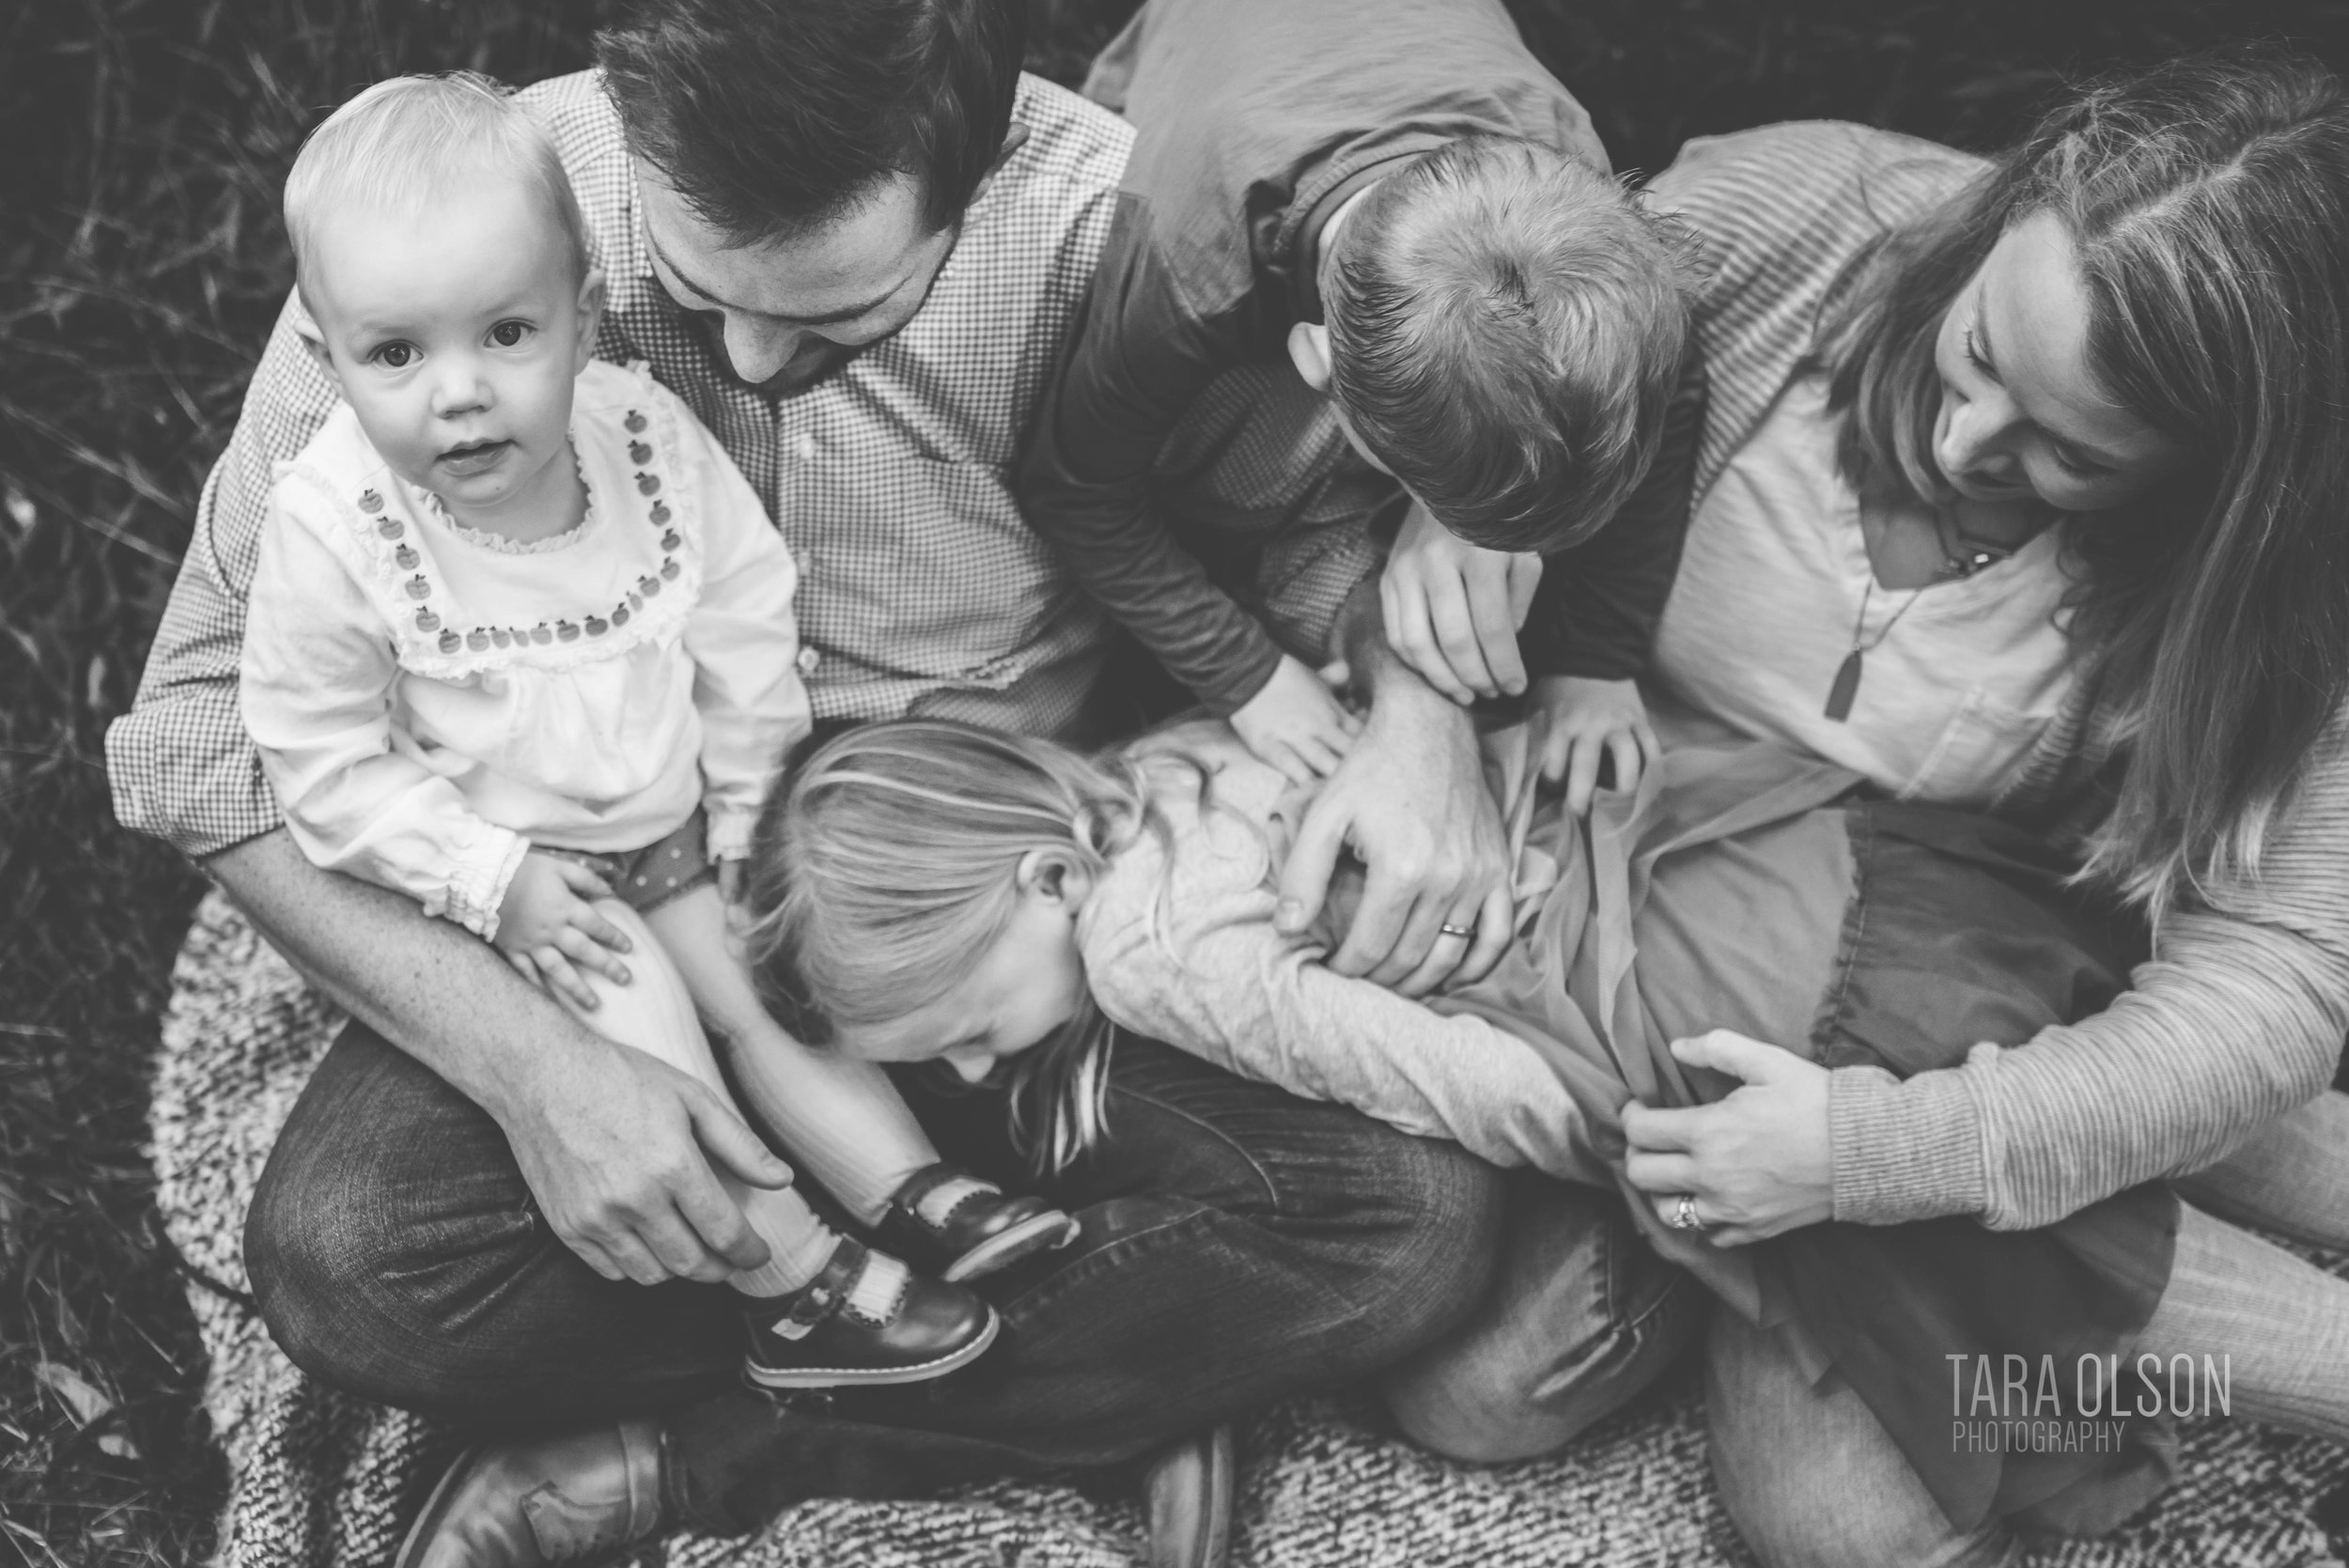 Hawkins_Arlington-Virginia-Family-Photographer_Tara-Olson-Photography_4080.jpg